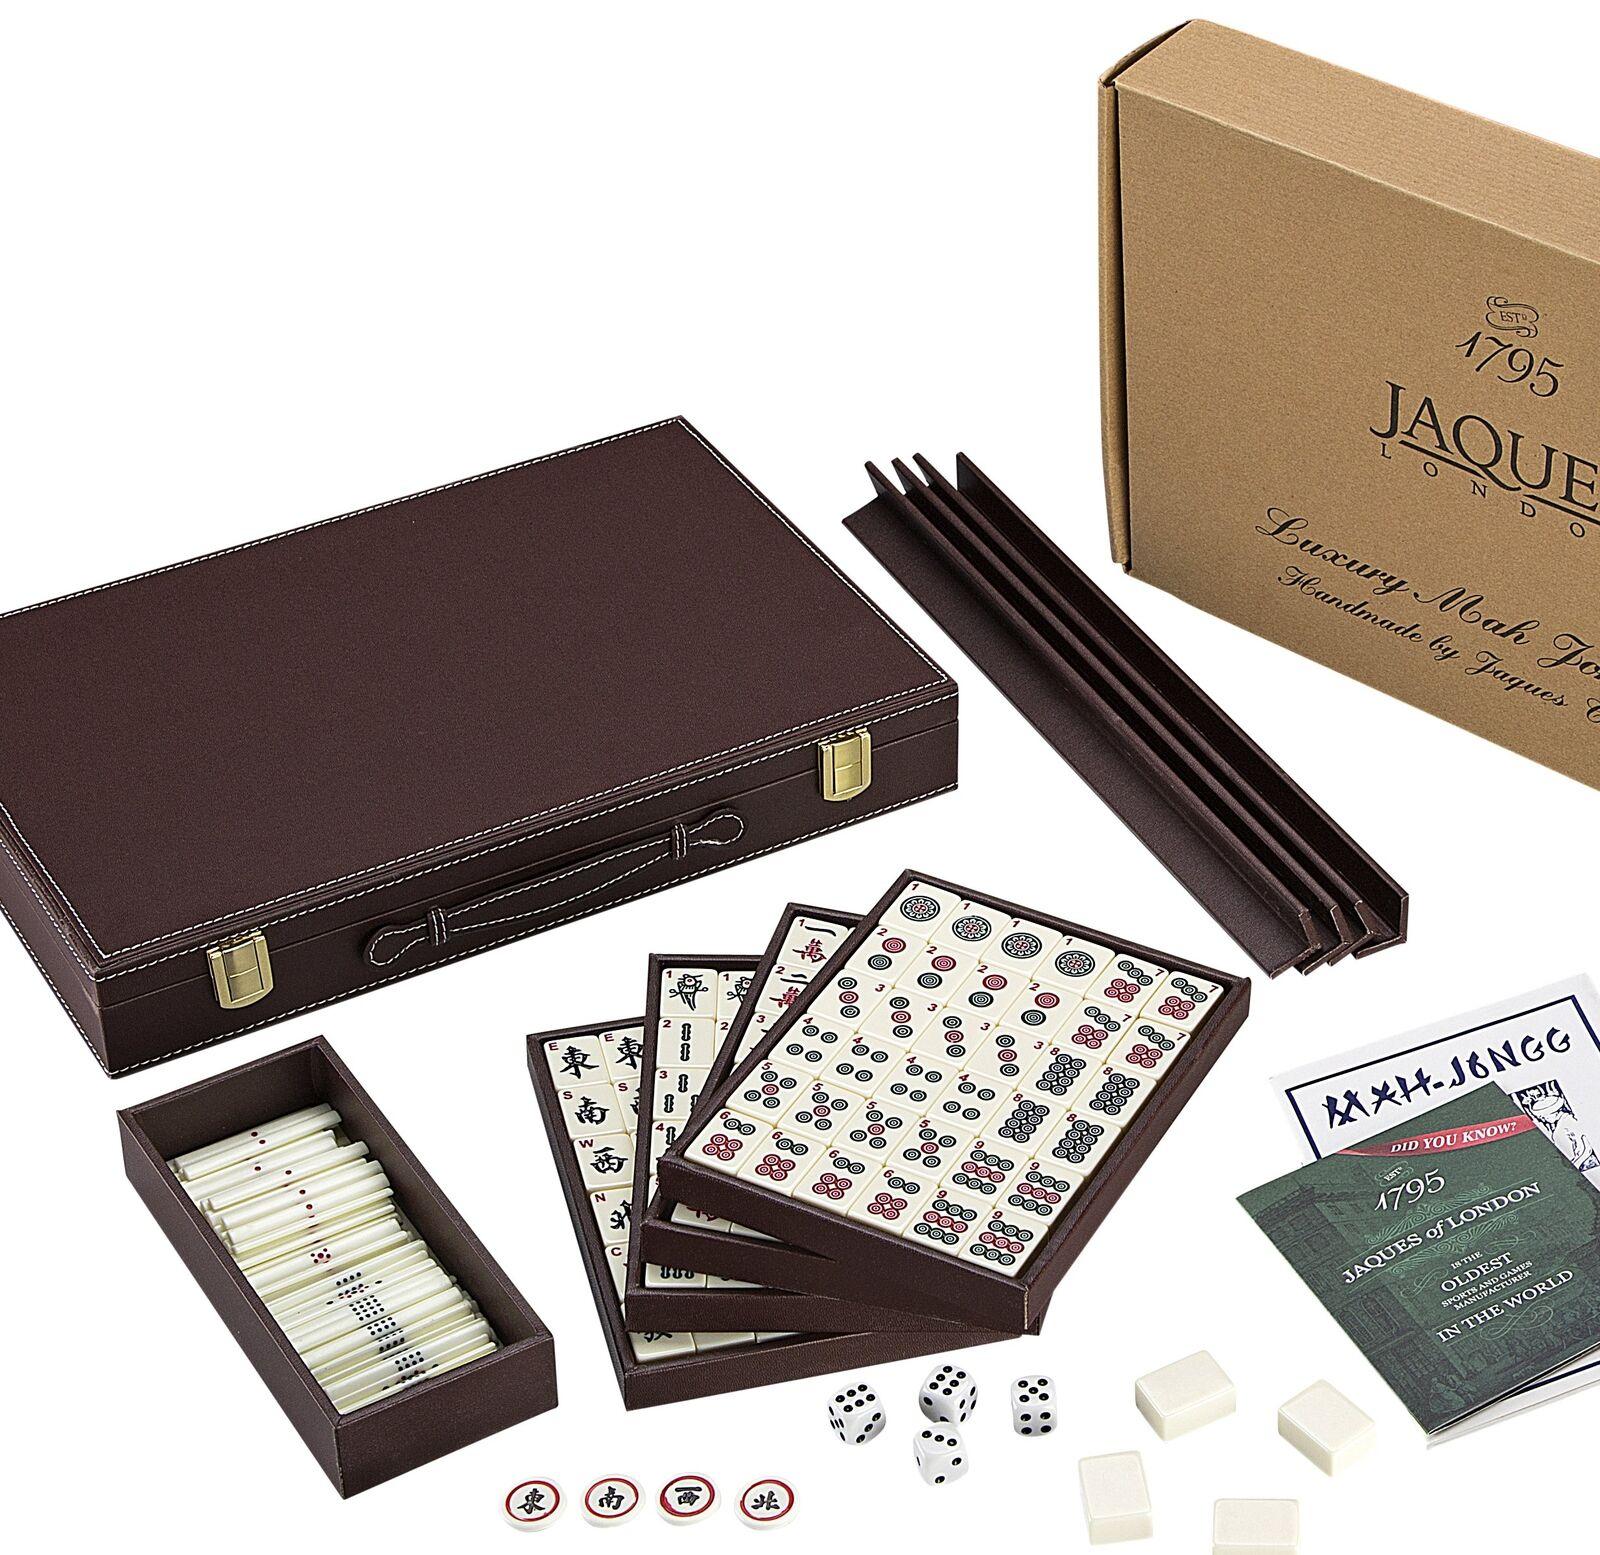 Mah Jongg Set - Luxury Club Mahjong Set - Jaques of London Since 1795